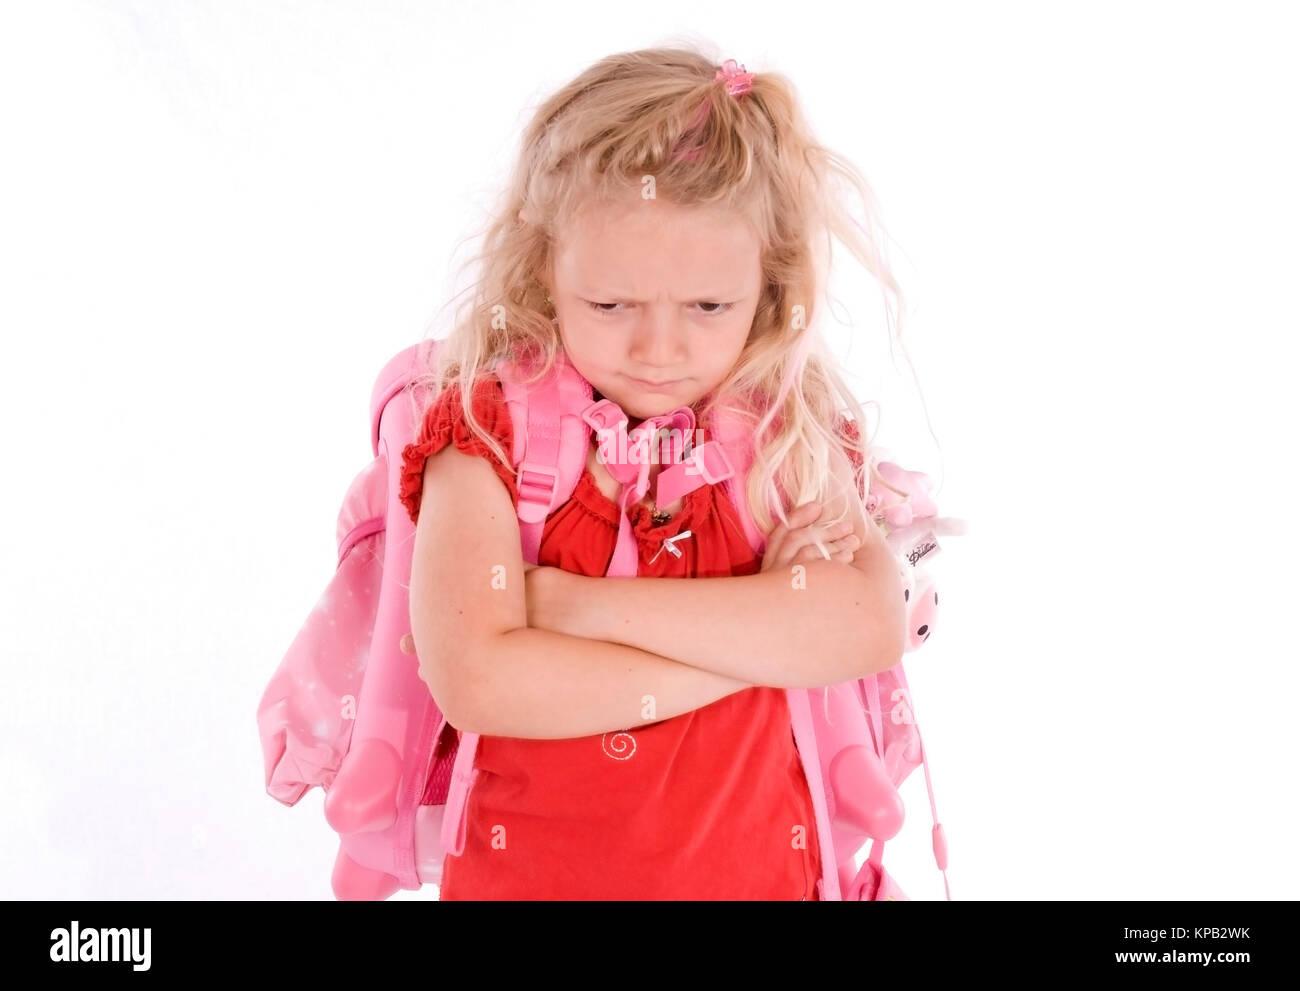 Model release, Schulmaedchen mit boesem Blick - school girl with bad look Stock Photo